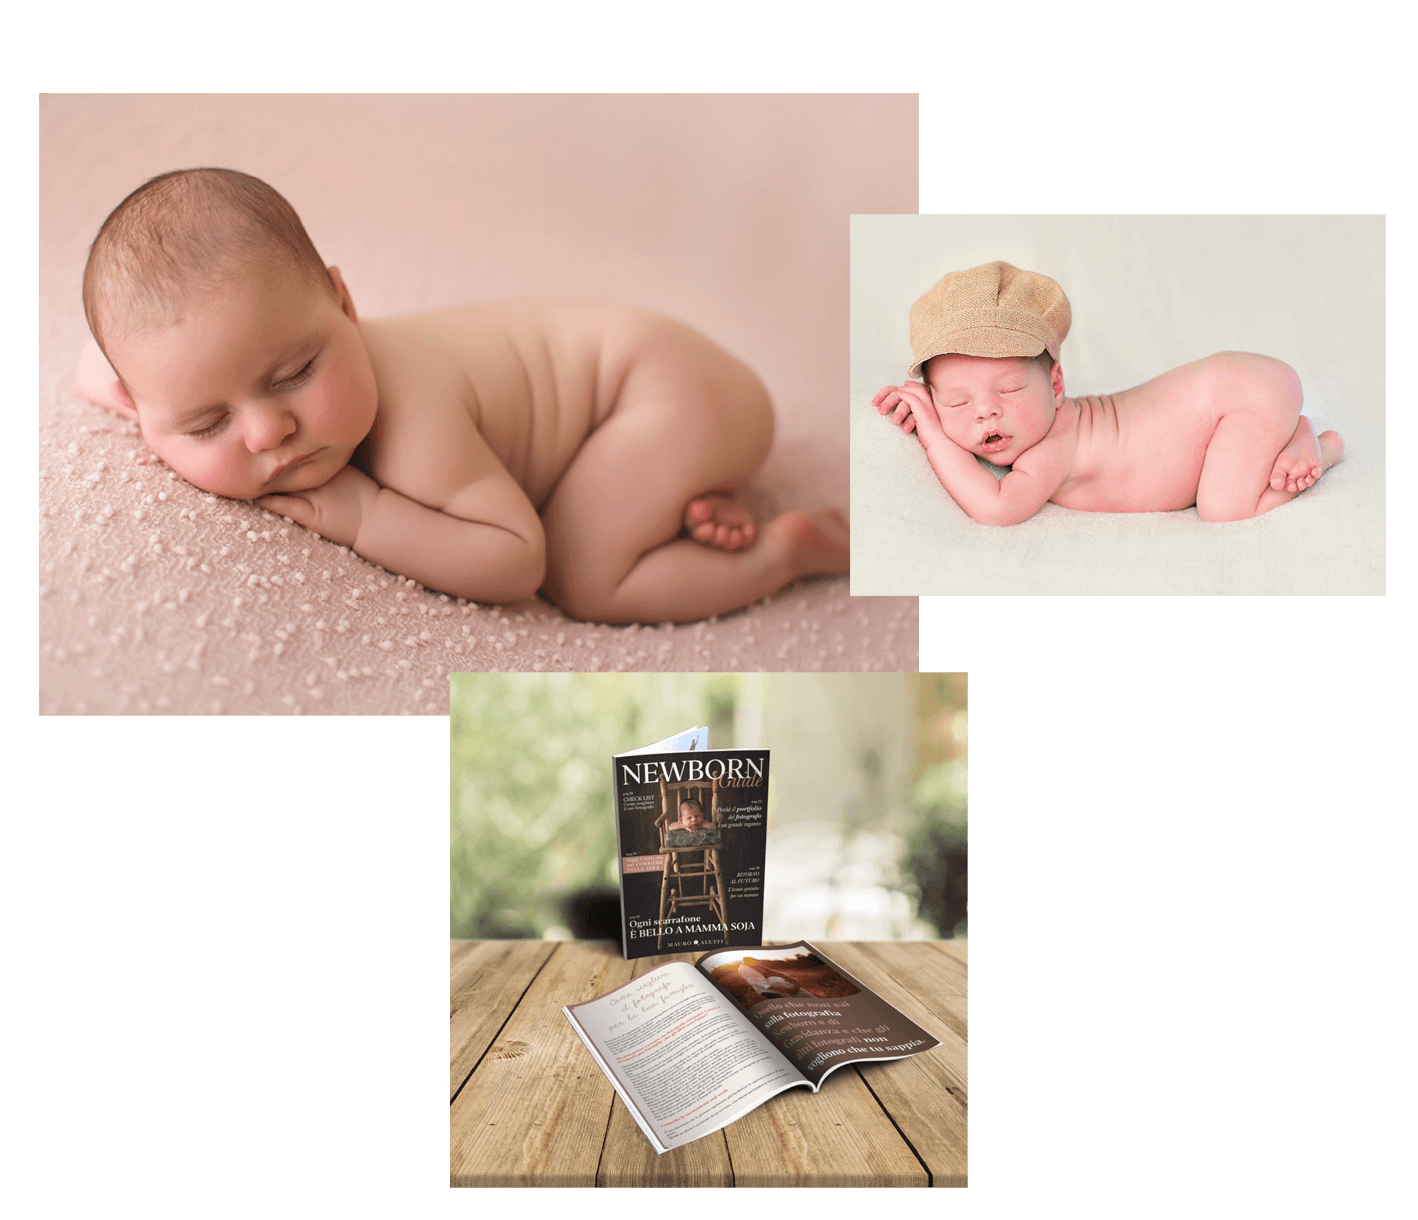 foto-newborn-corretta